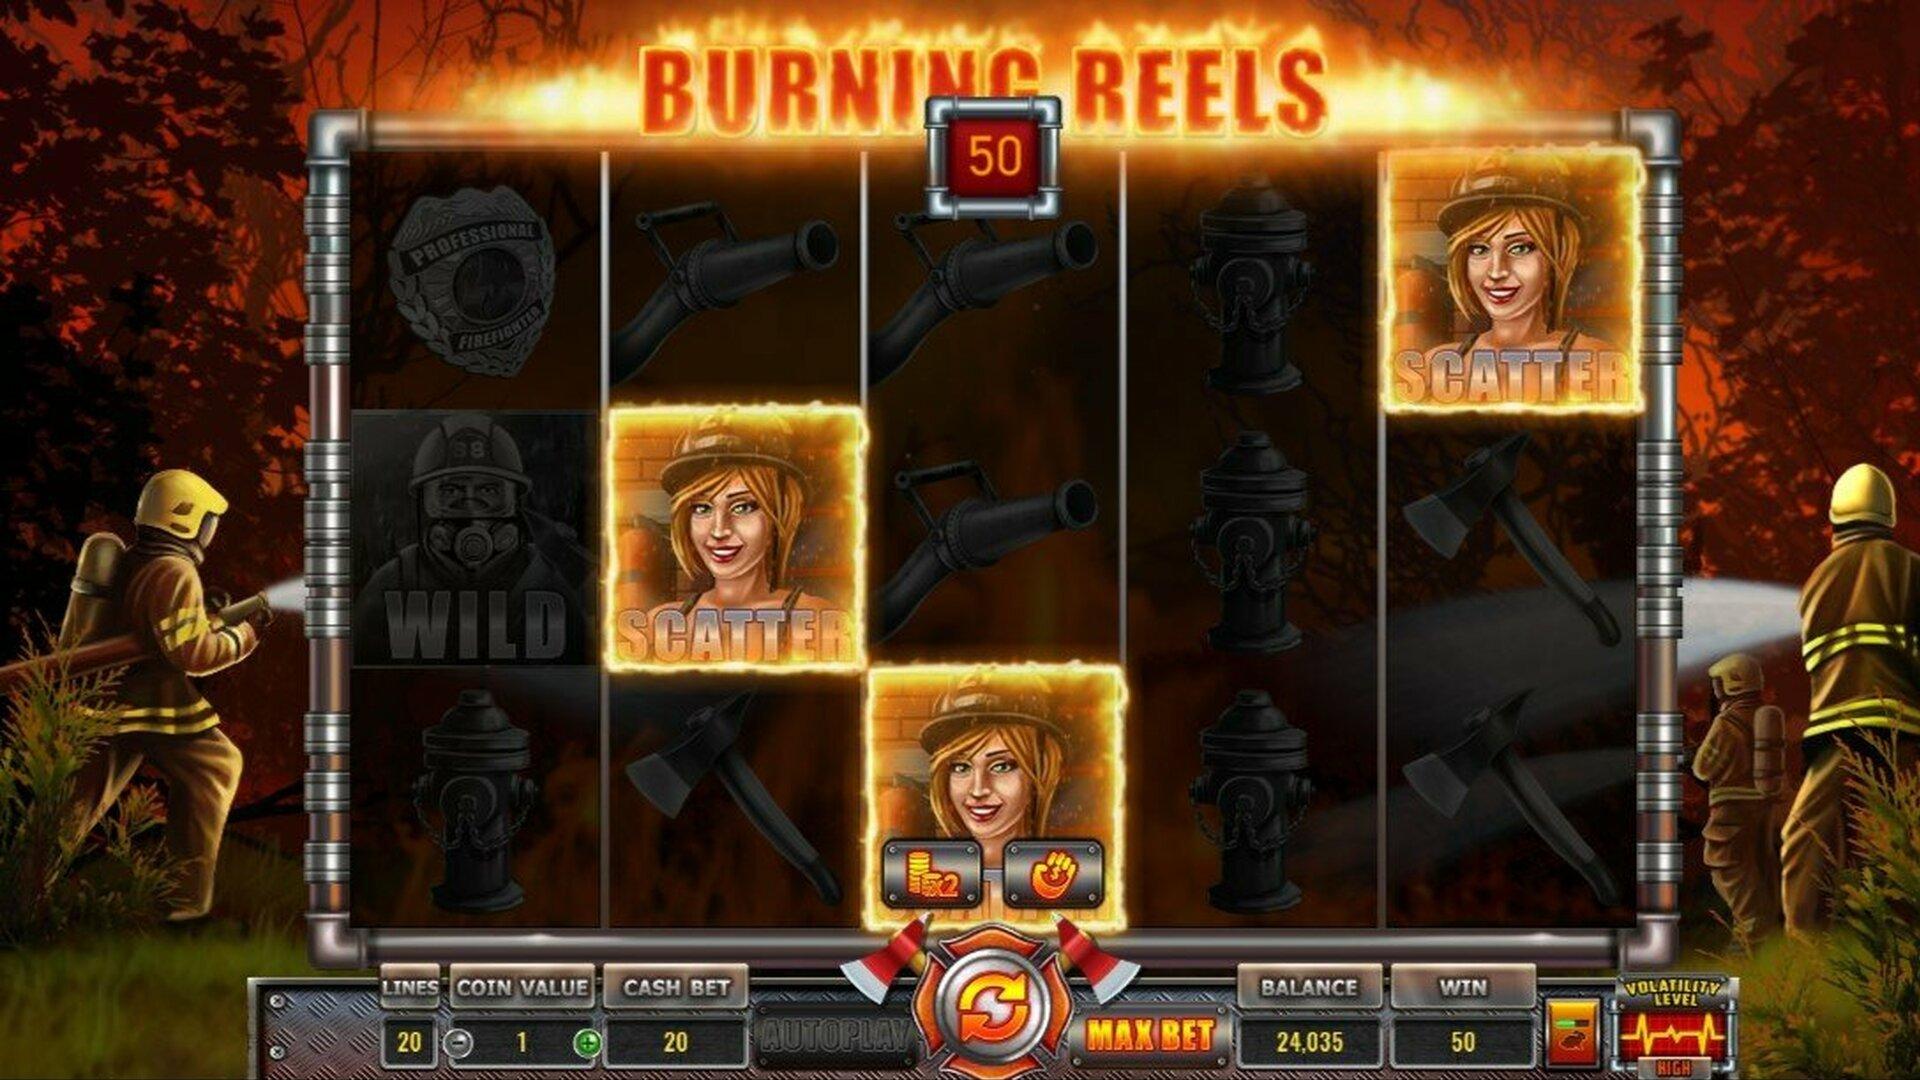 Wazdan Released its new Burining Reels Slot